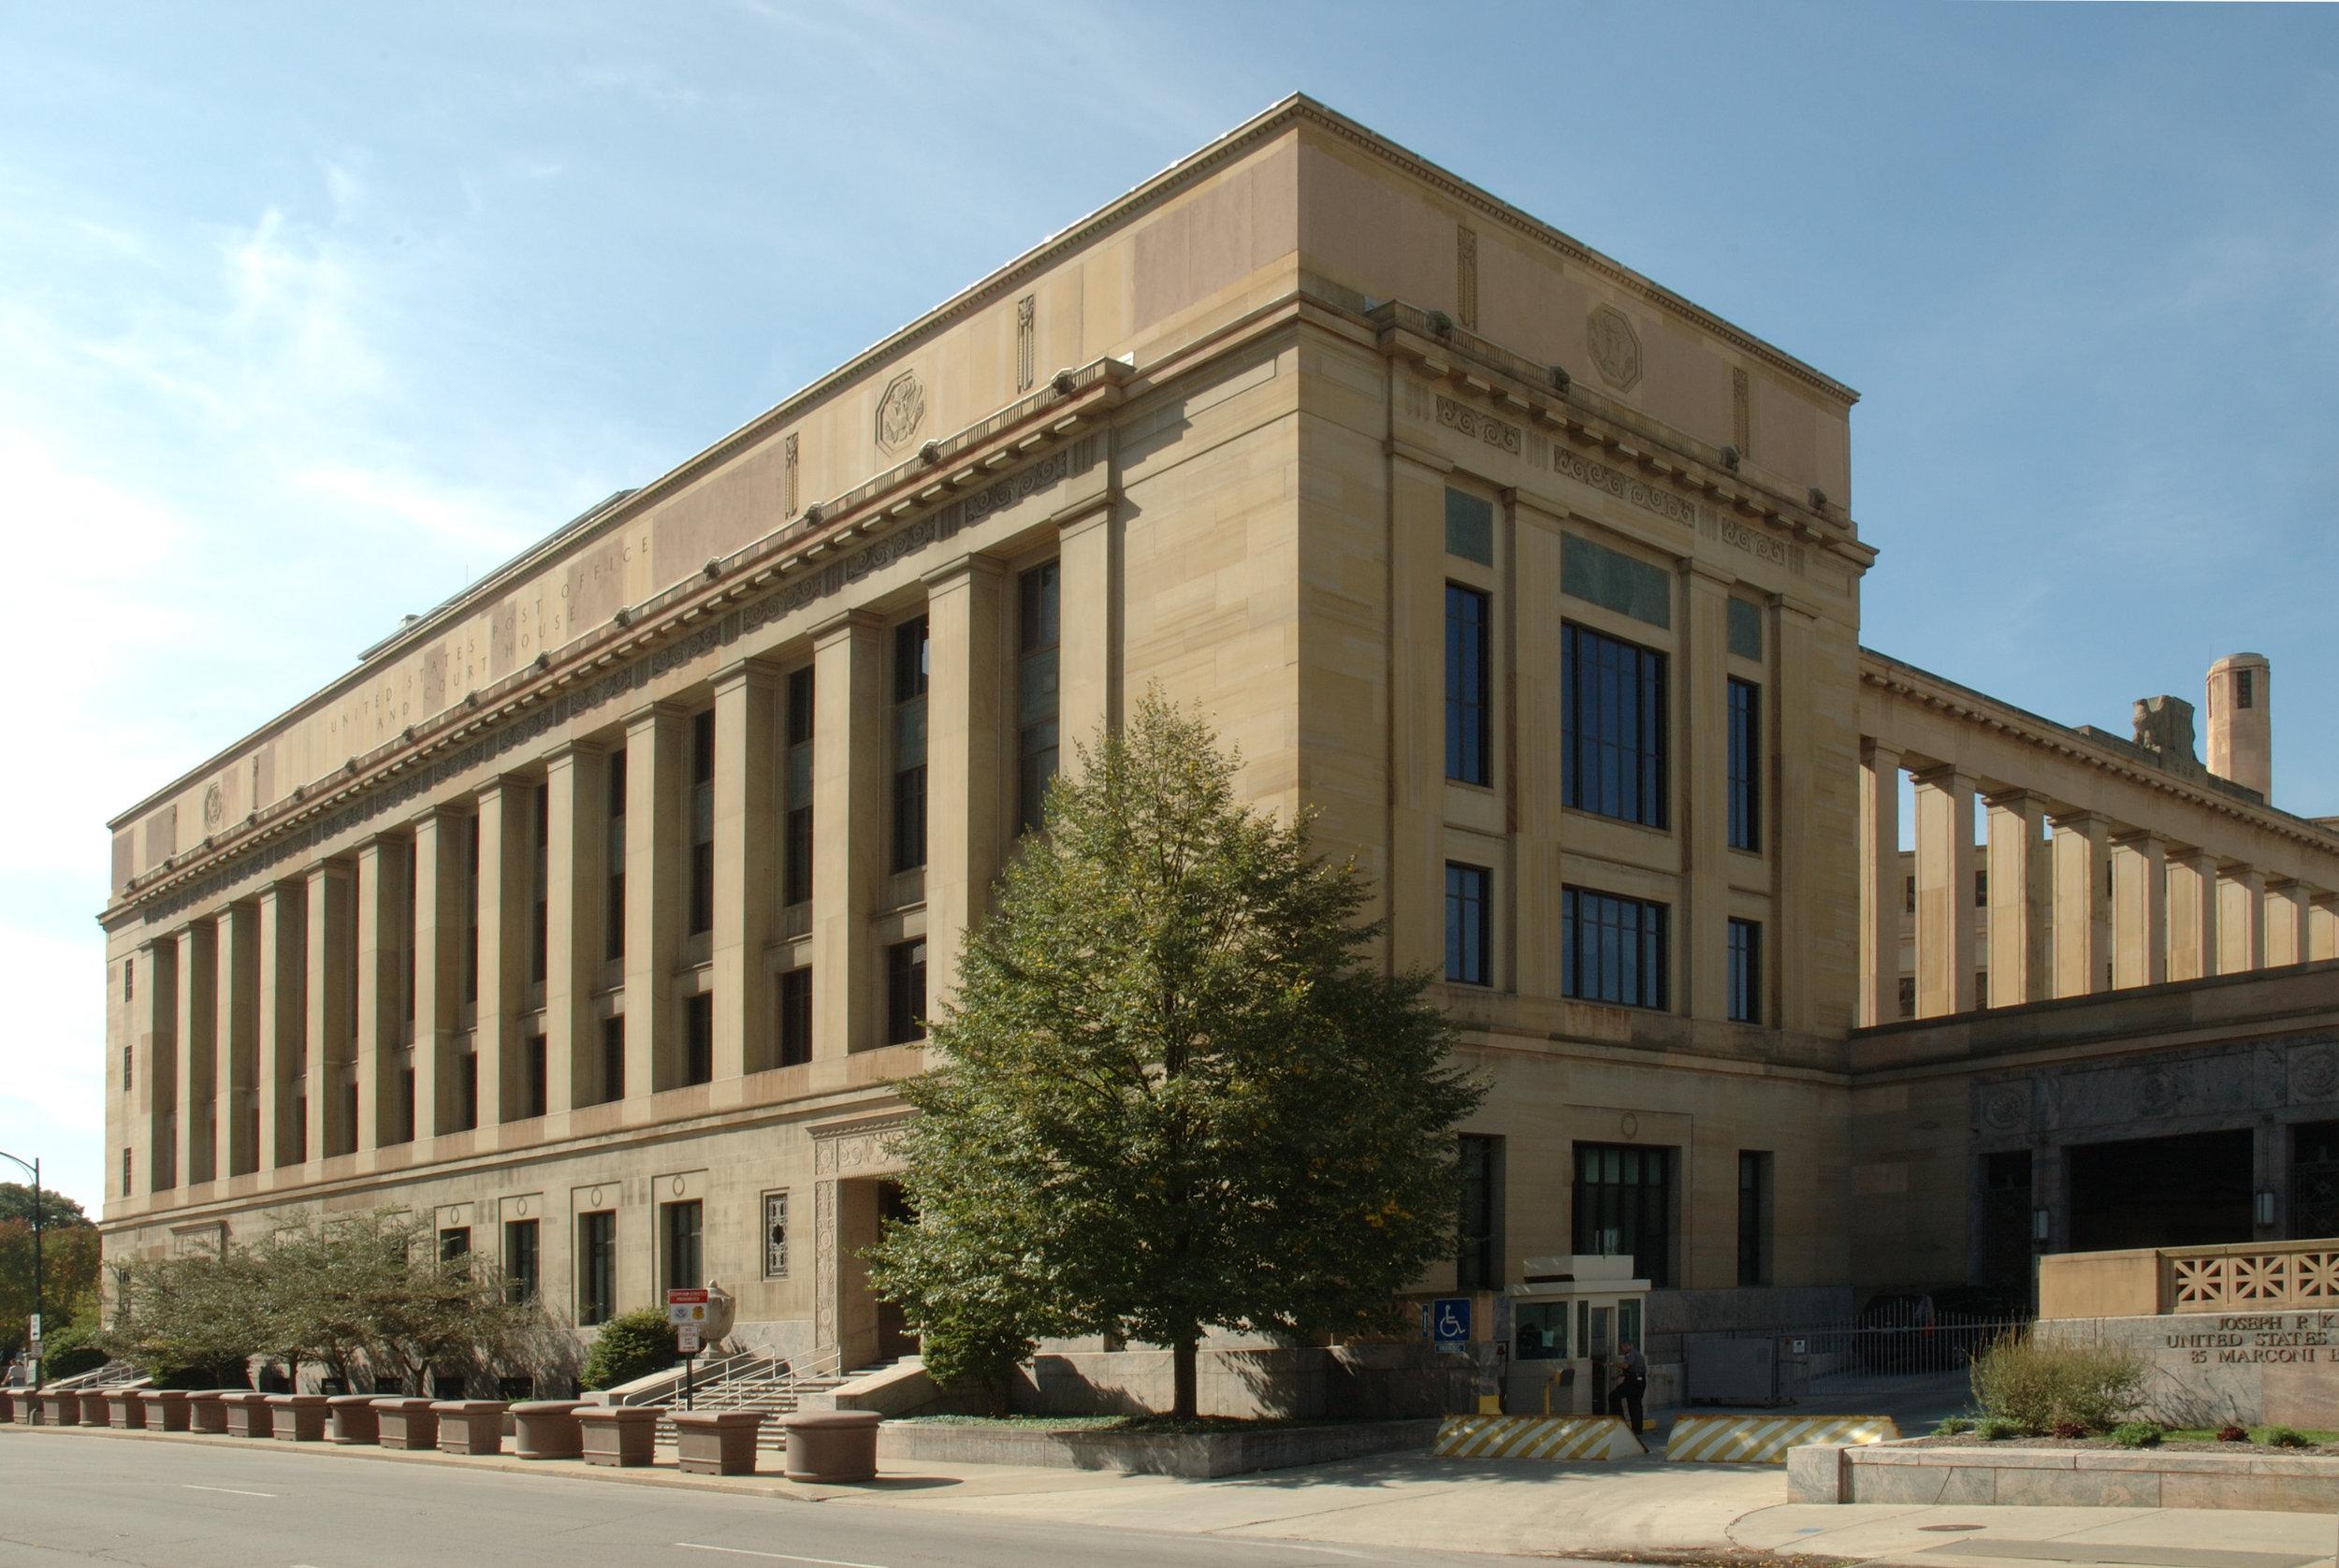 Architect: Kinneary U.S. Courthouse